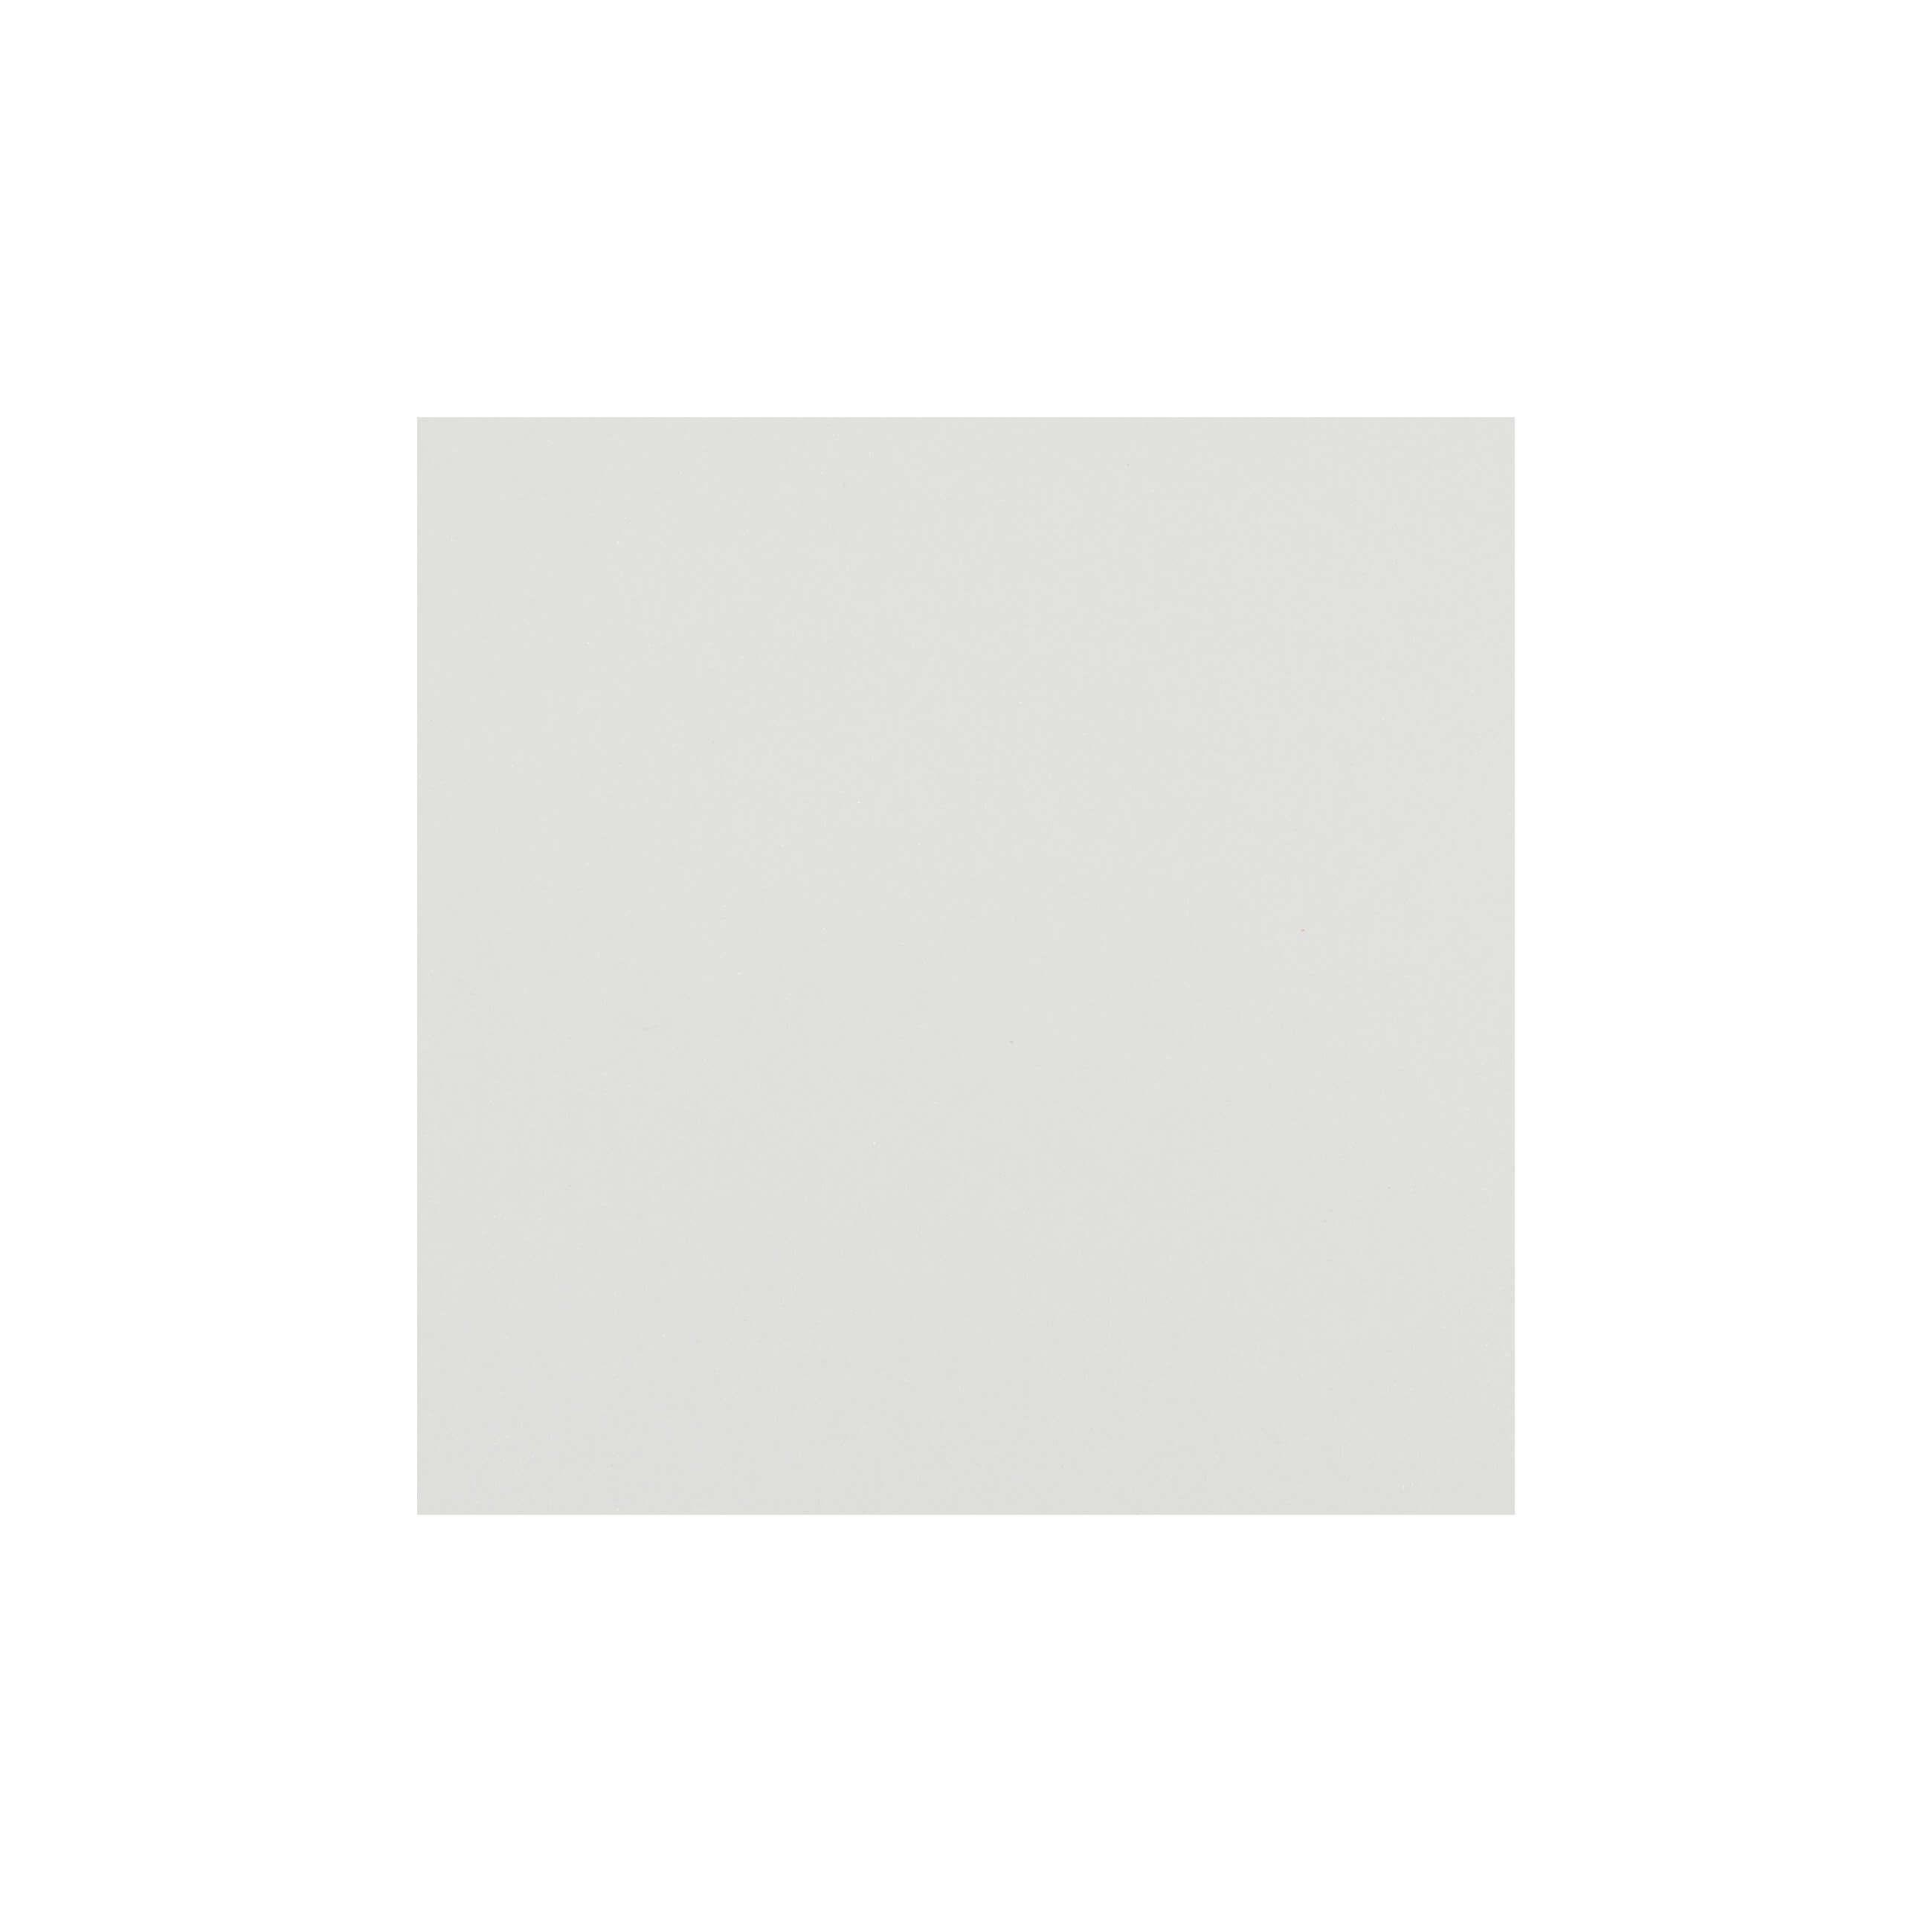 Cardstock 125mm Square - Ivory Sparkle